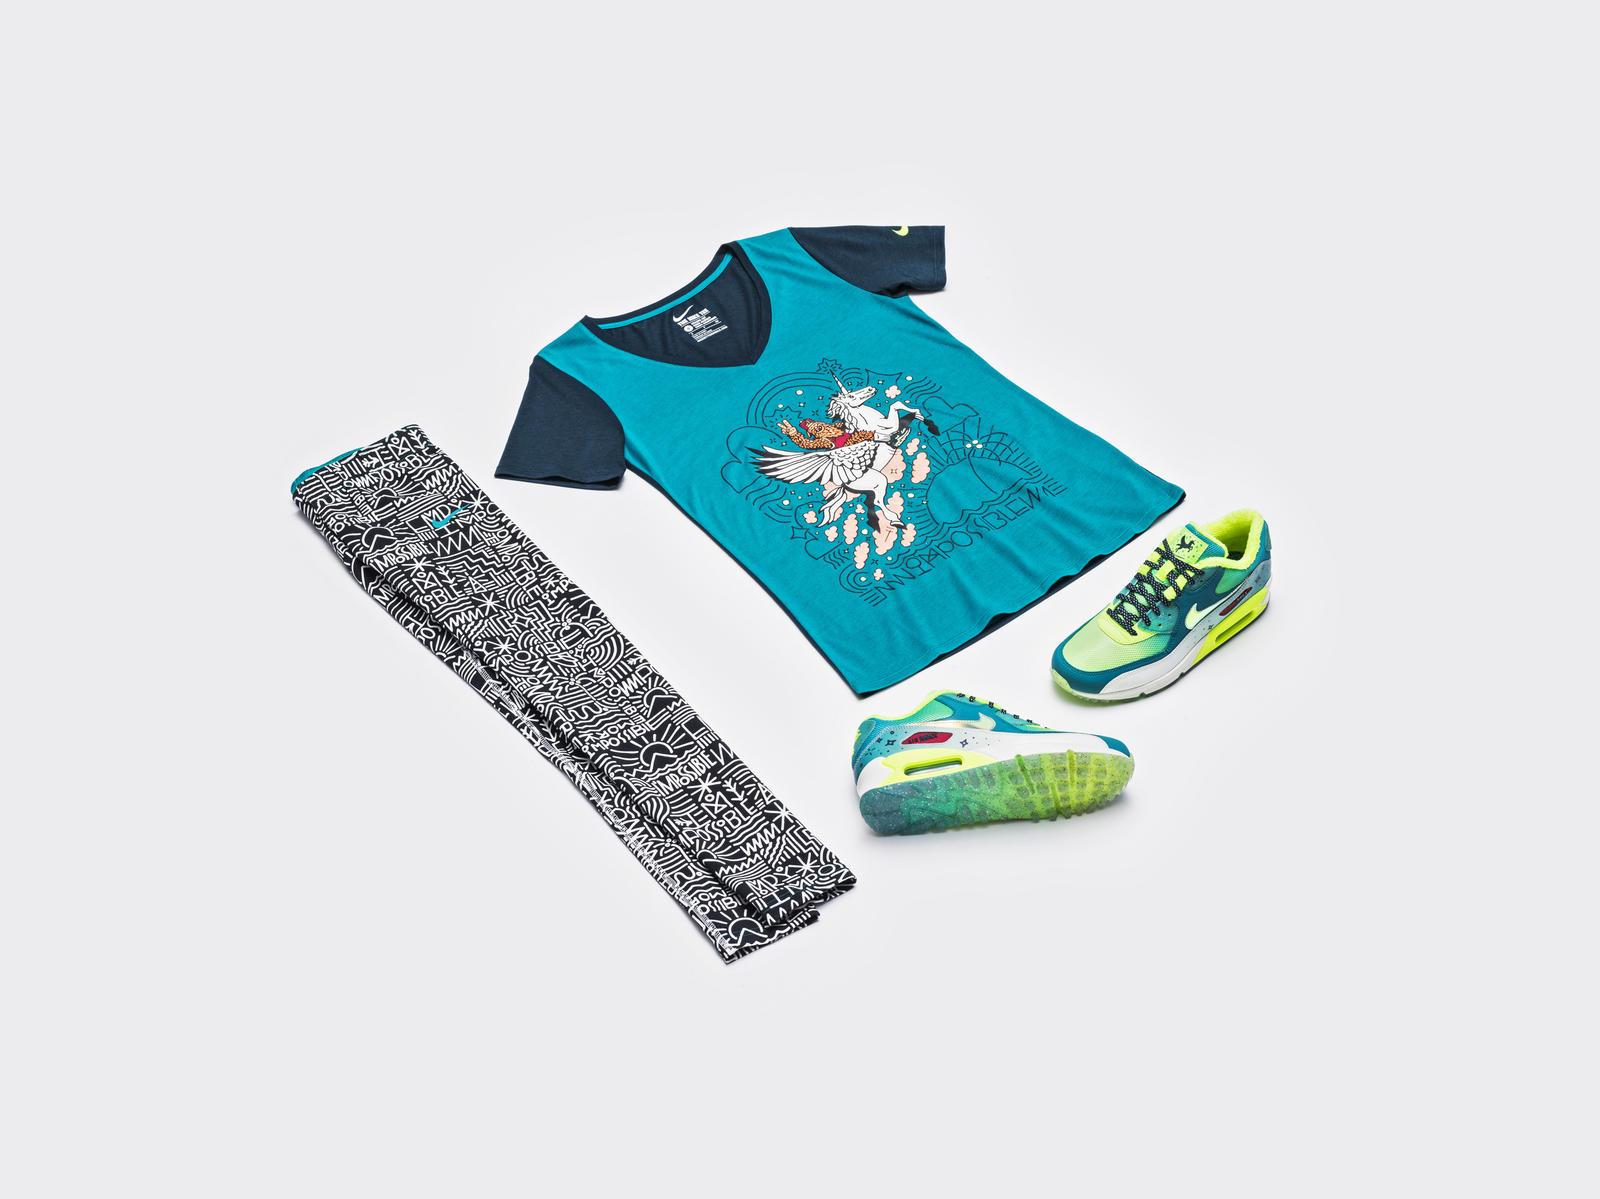 Nike_DBFS_2015_EMORY_GROUP_laydown_native_1600